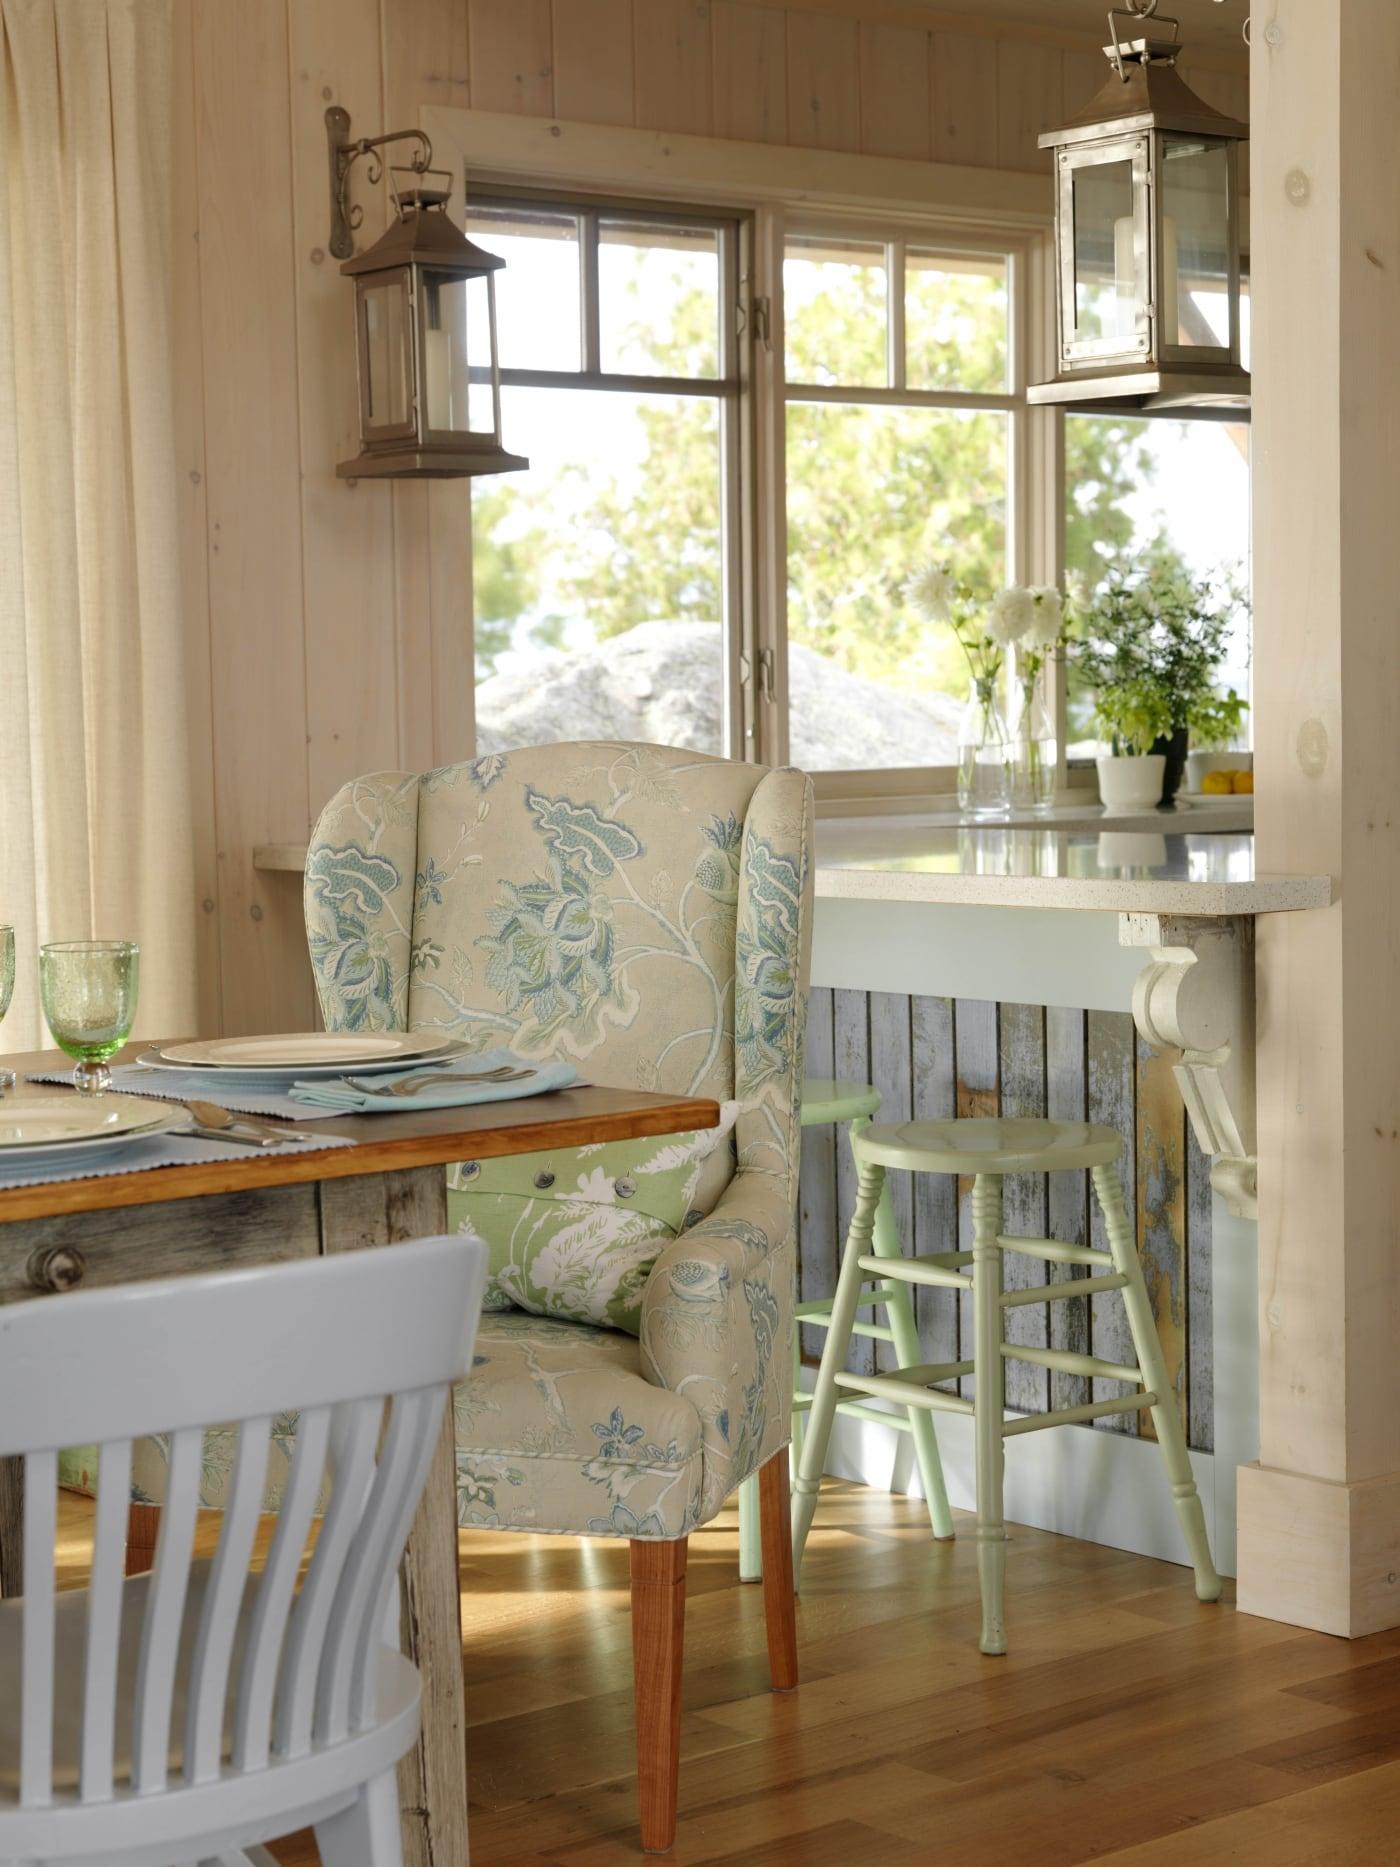 Green bar stool and distressed bar paneling. #SarahRichardson #cottagestyle #lantern